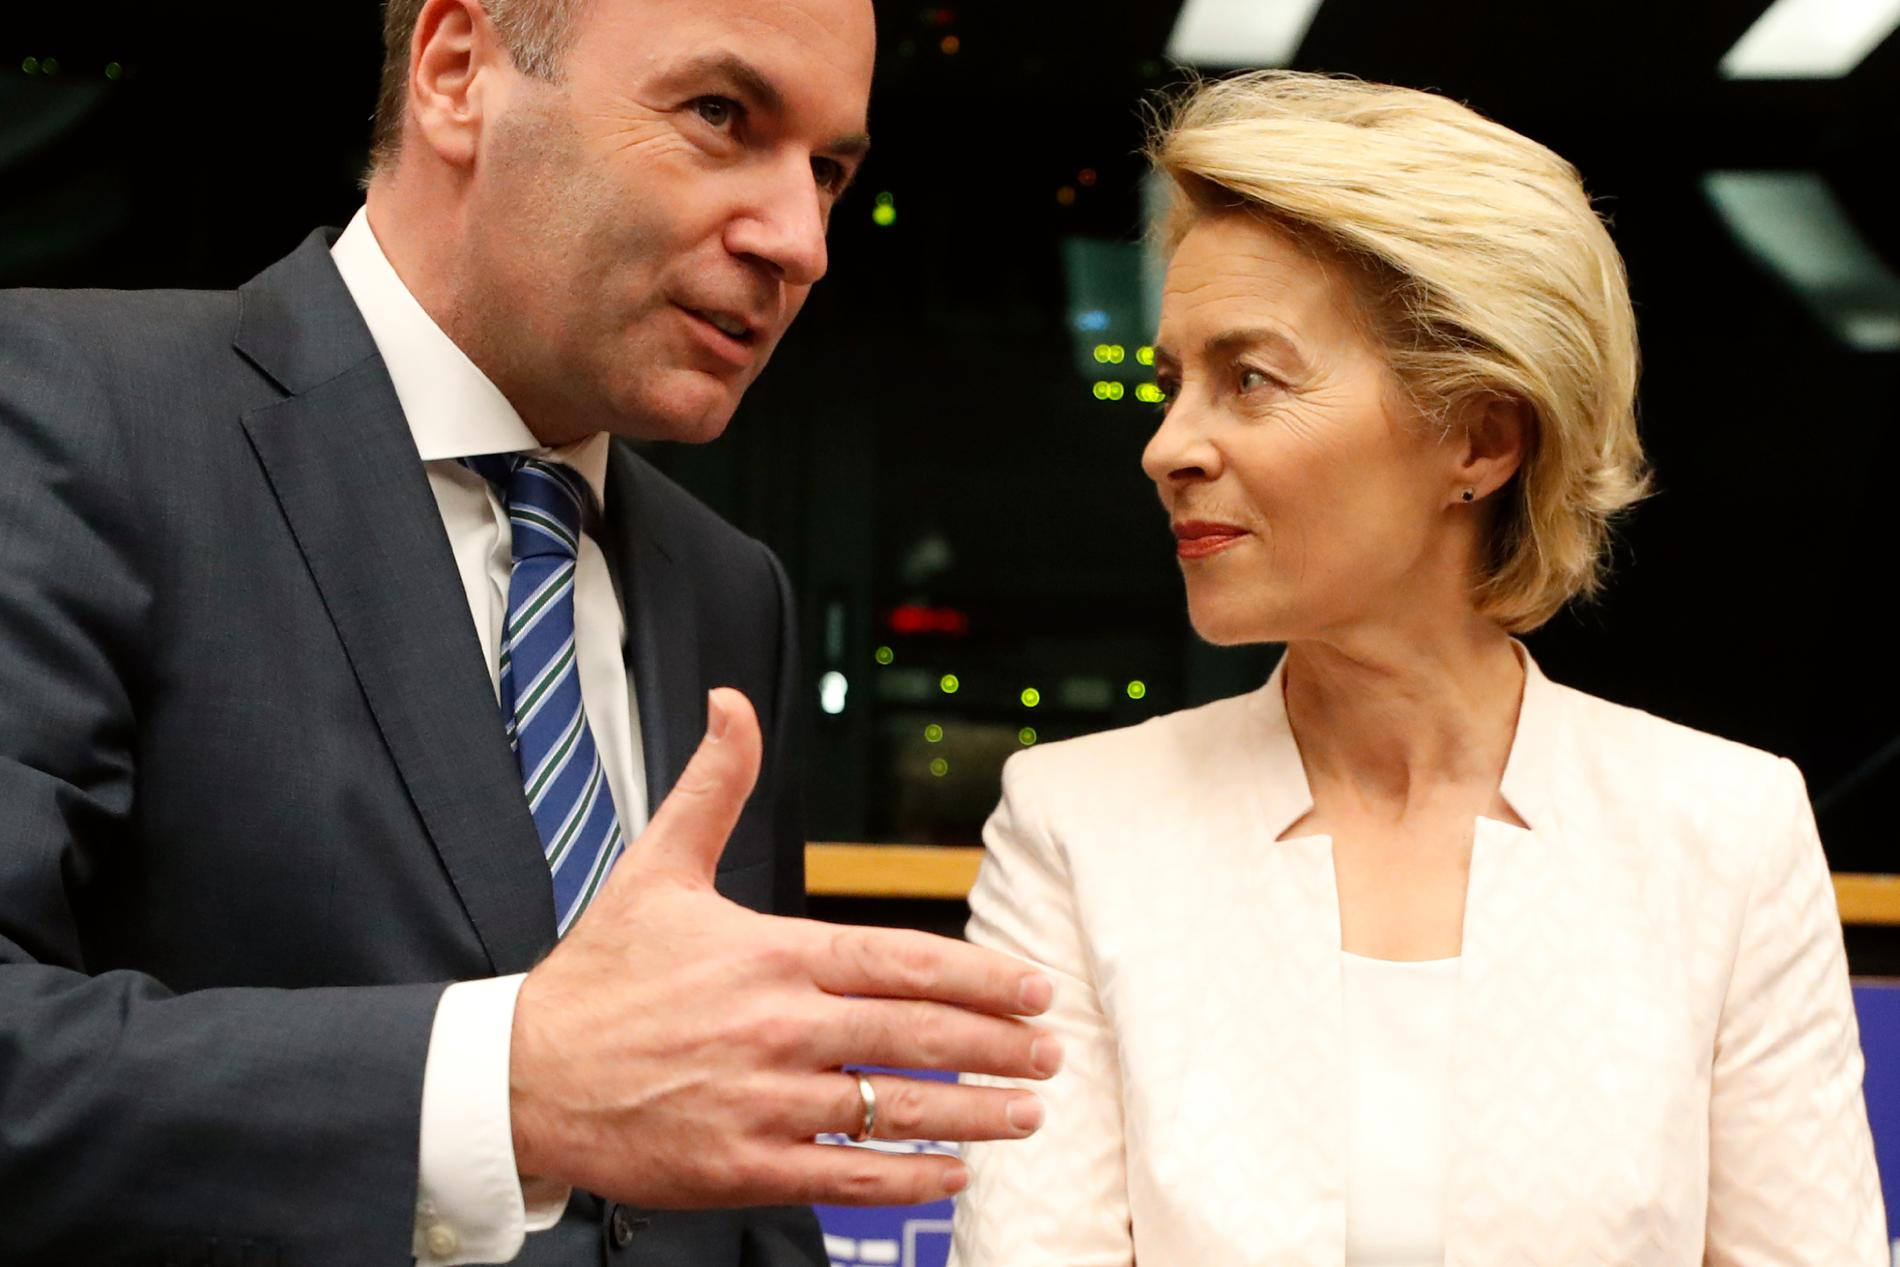 Ursula von der Leyen tillsammans med kristdemokratiskt konservativa partigruppen EPP:s tidigare spitzenkandidat Manfred Weber i EU-parlamentet i Strasbourg.